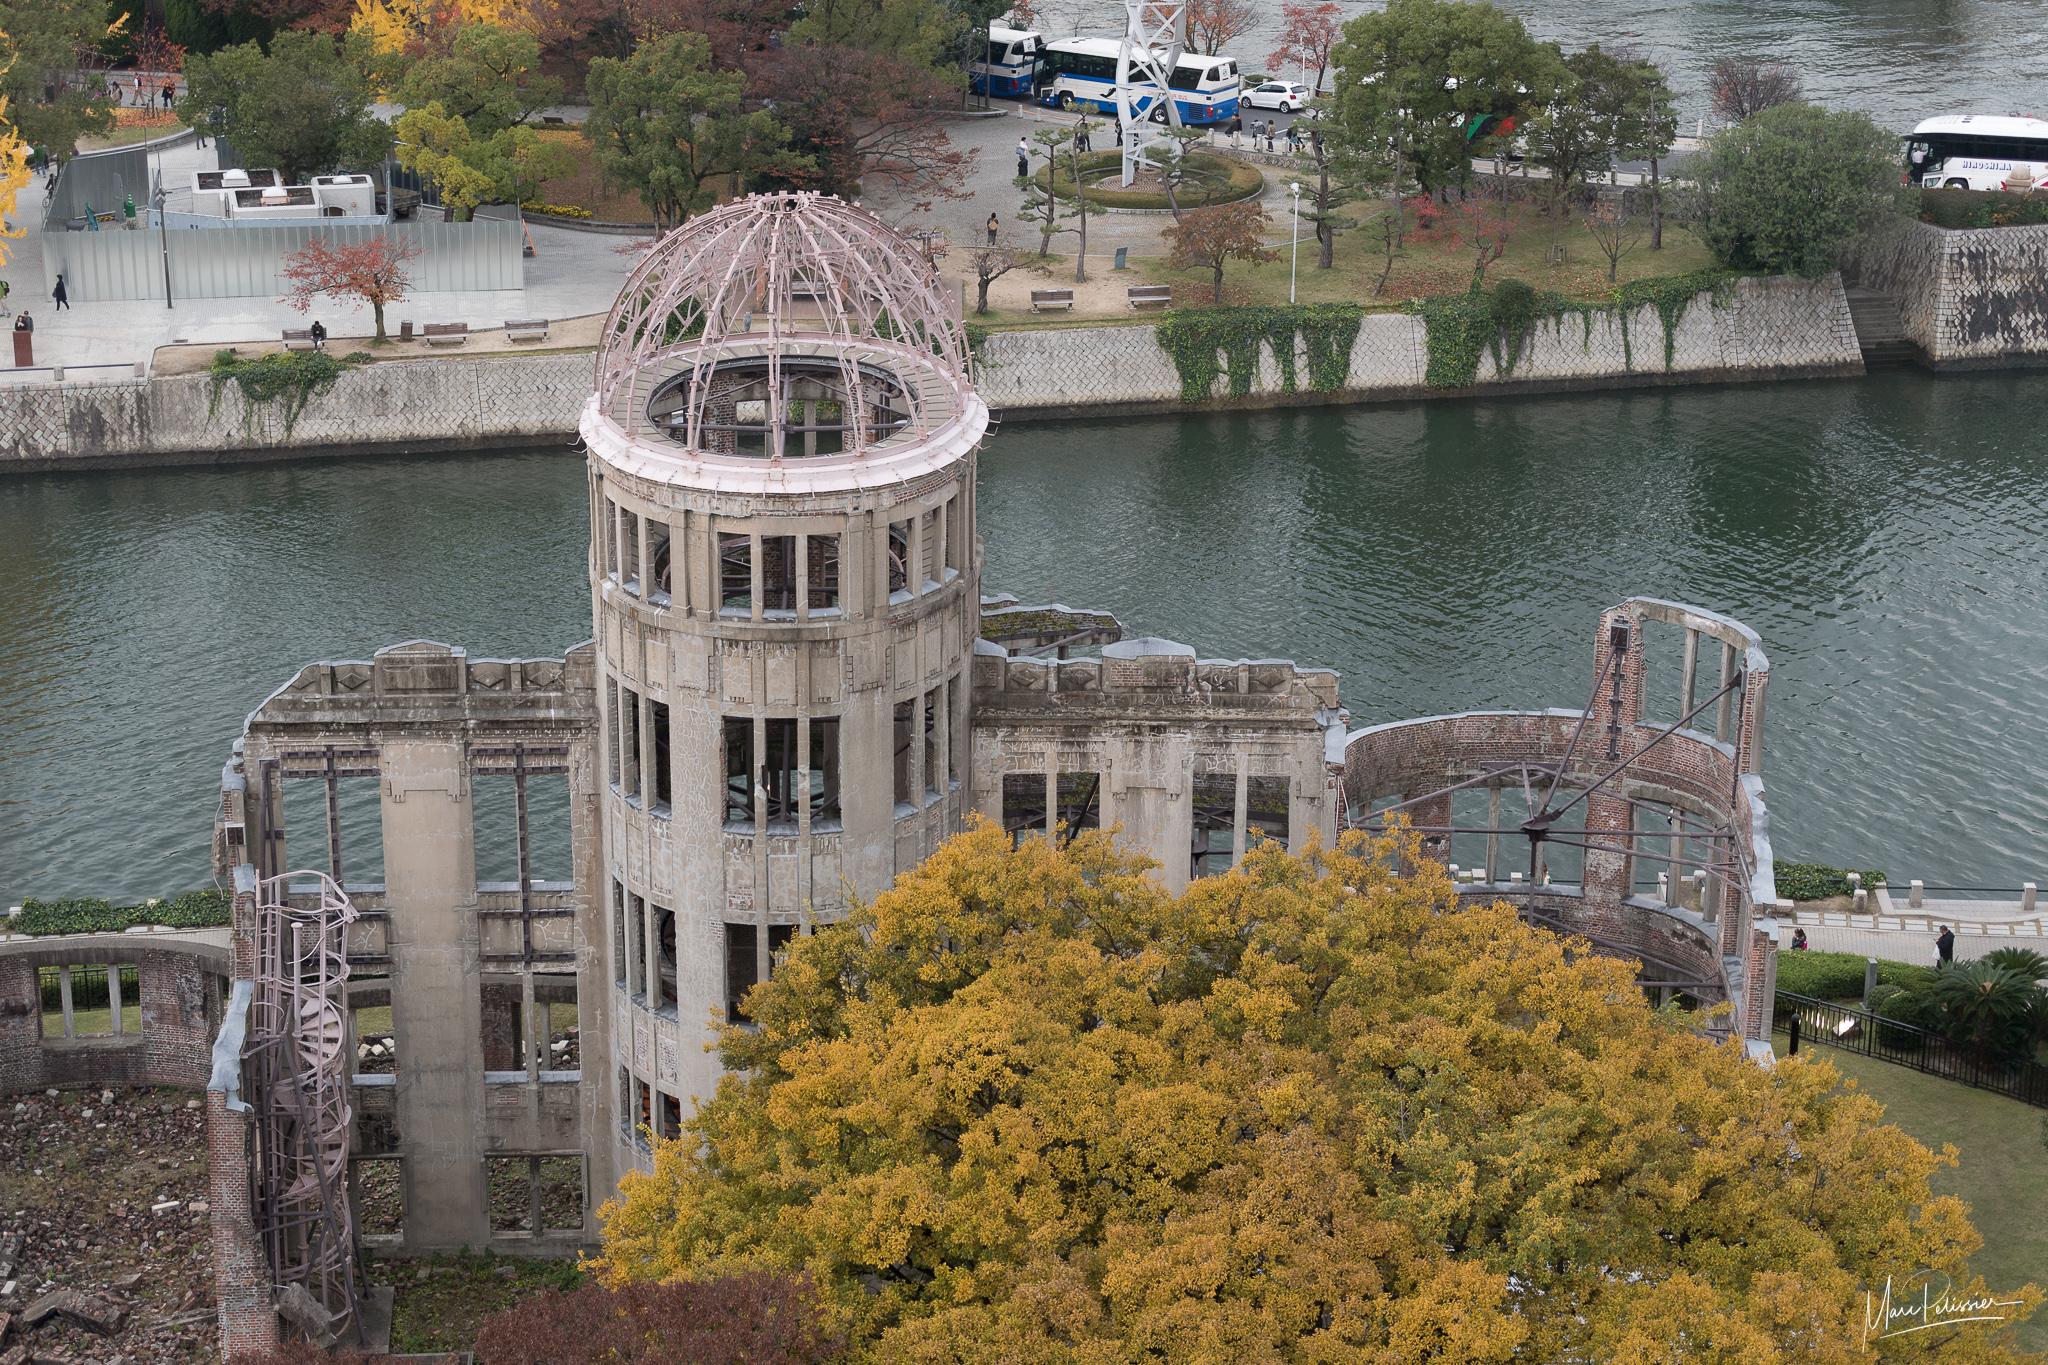 Hiroshima dome from Orizuru tower, Japan